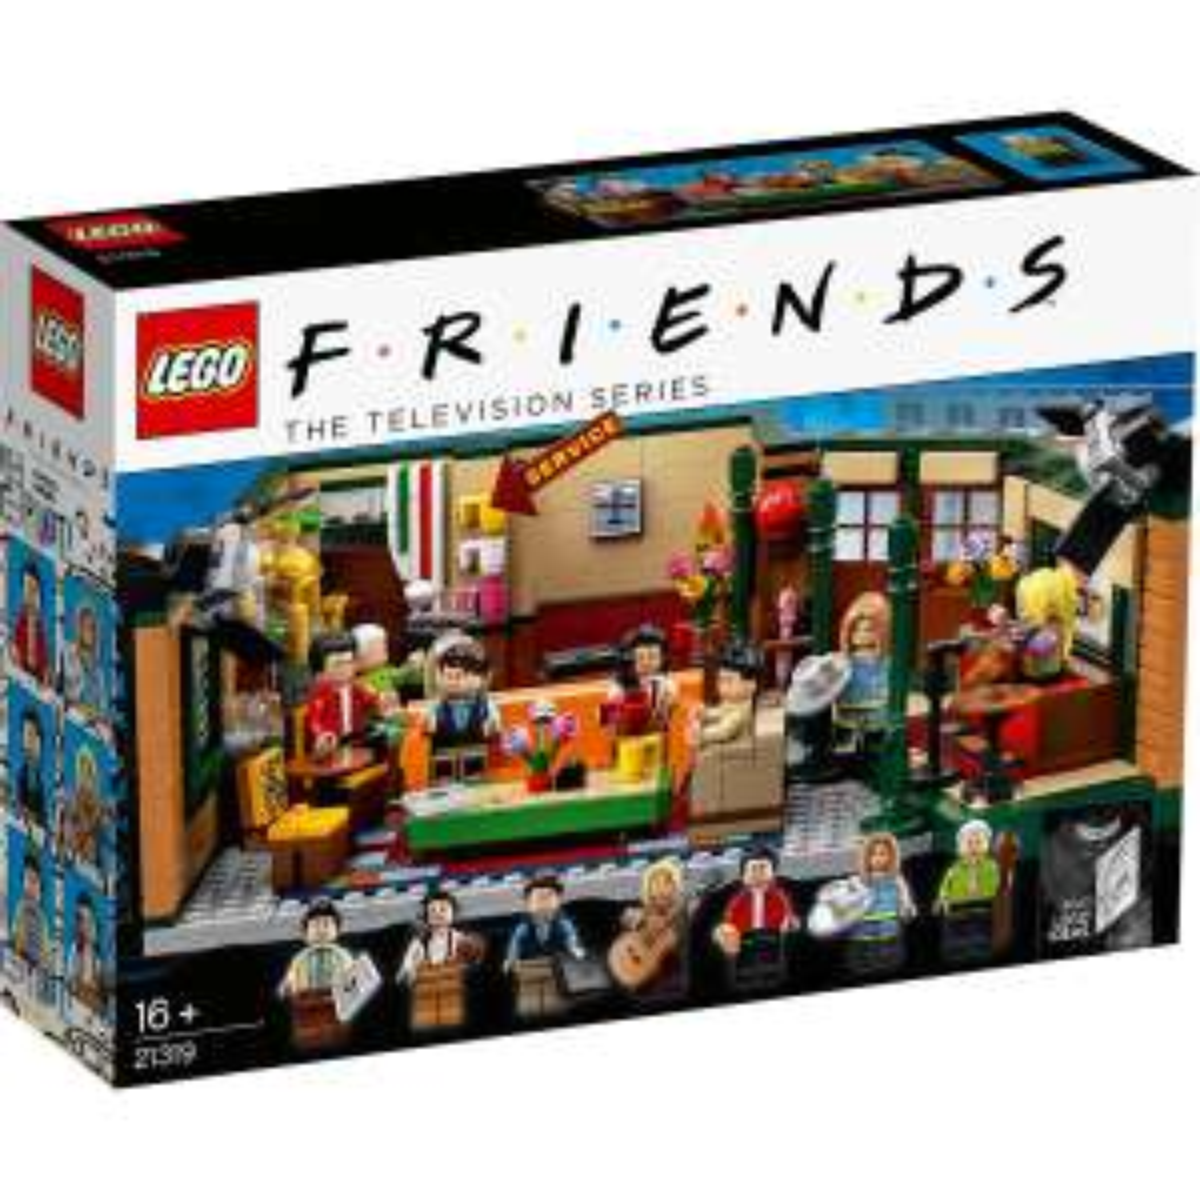 Lego 21319 - IDEAS Friends Central Perk Cafe